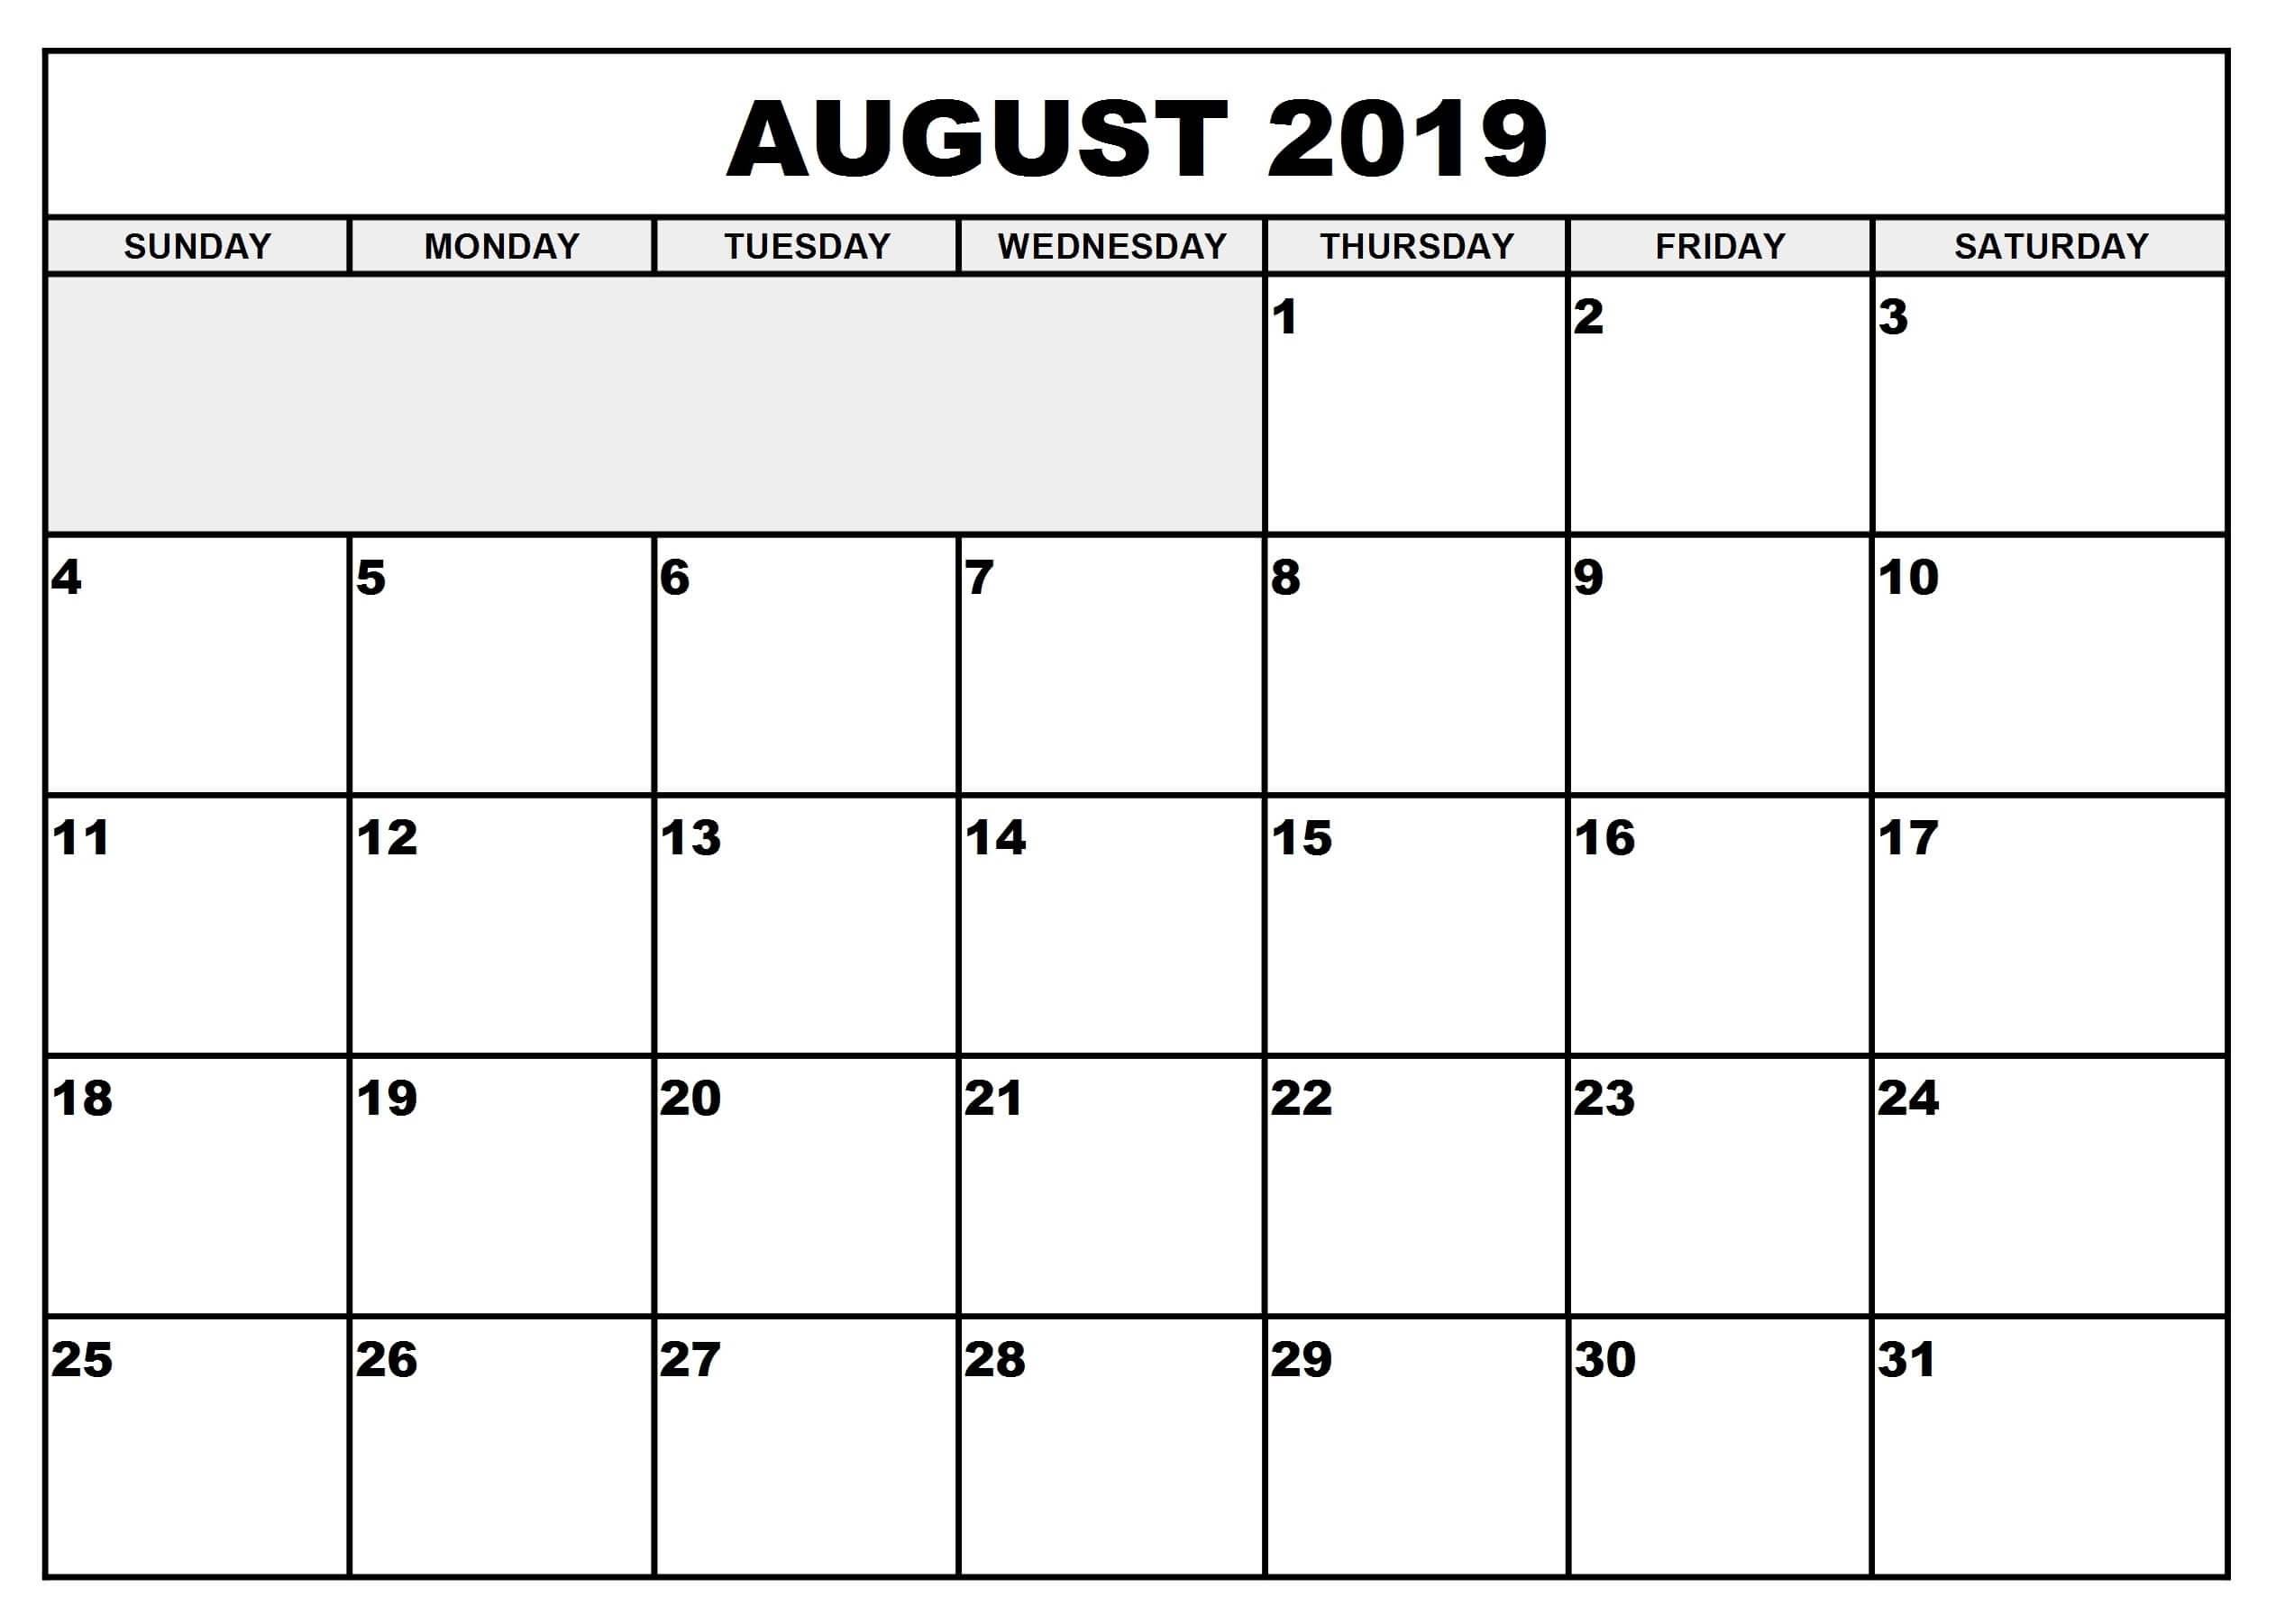 August 2019 Calendar With Holidays Malaysia - Printable Calendar with regard to Blank Calender August Printable